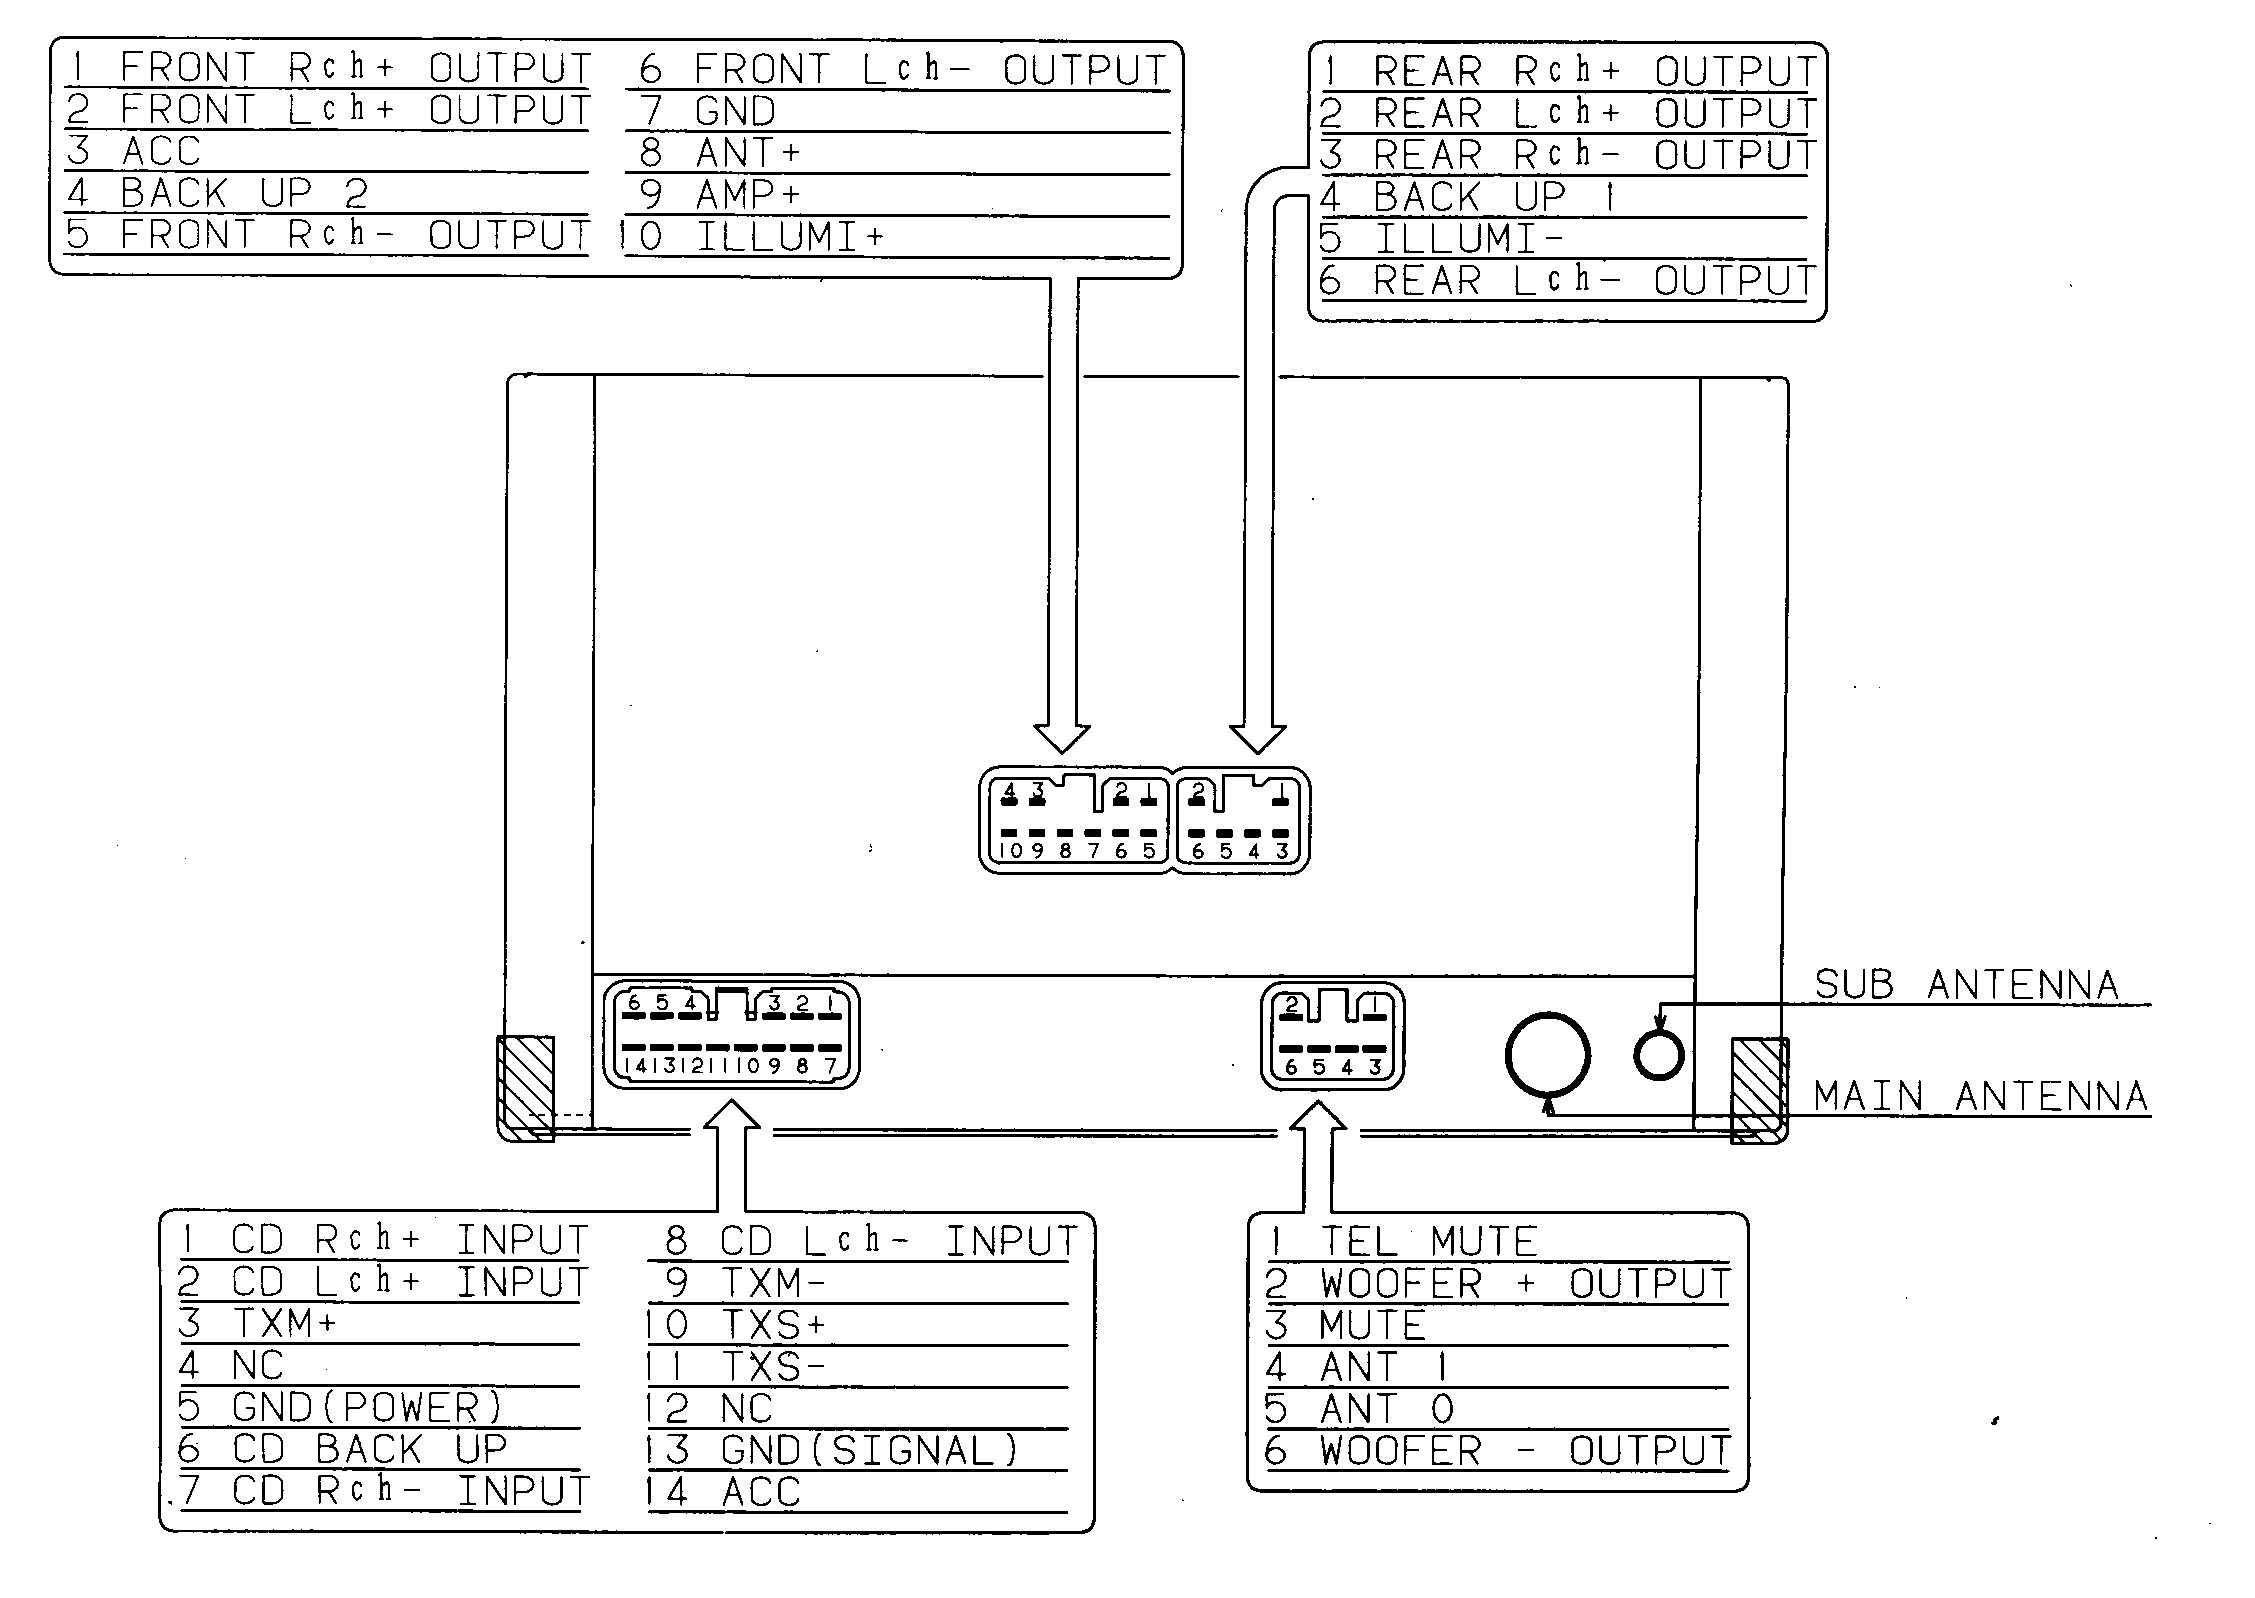 Toyota Fujitsu Ten 86120 Wiring Diagram Car Stereo Pioneer Car Stereo Sony Car Stereo